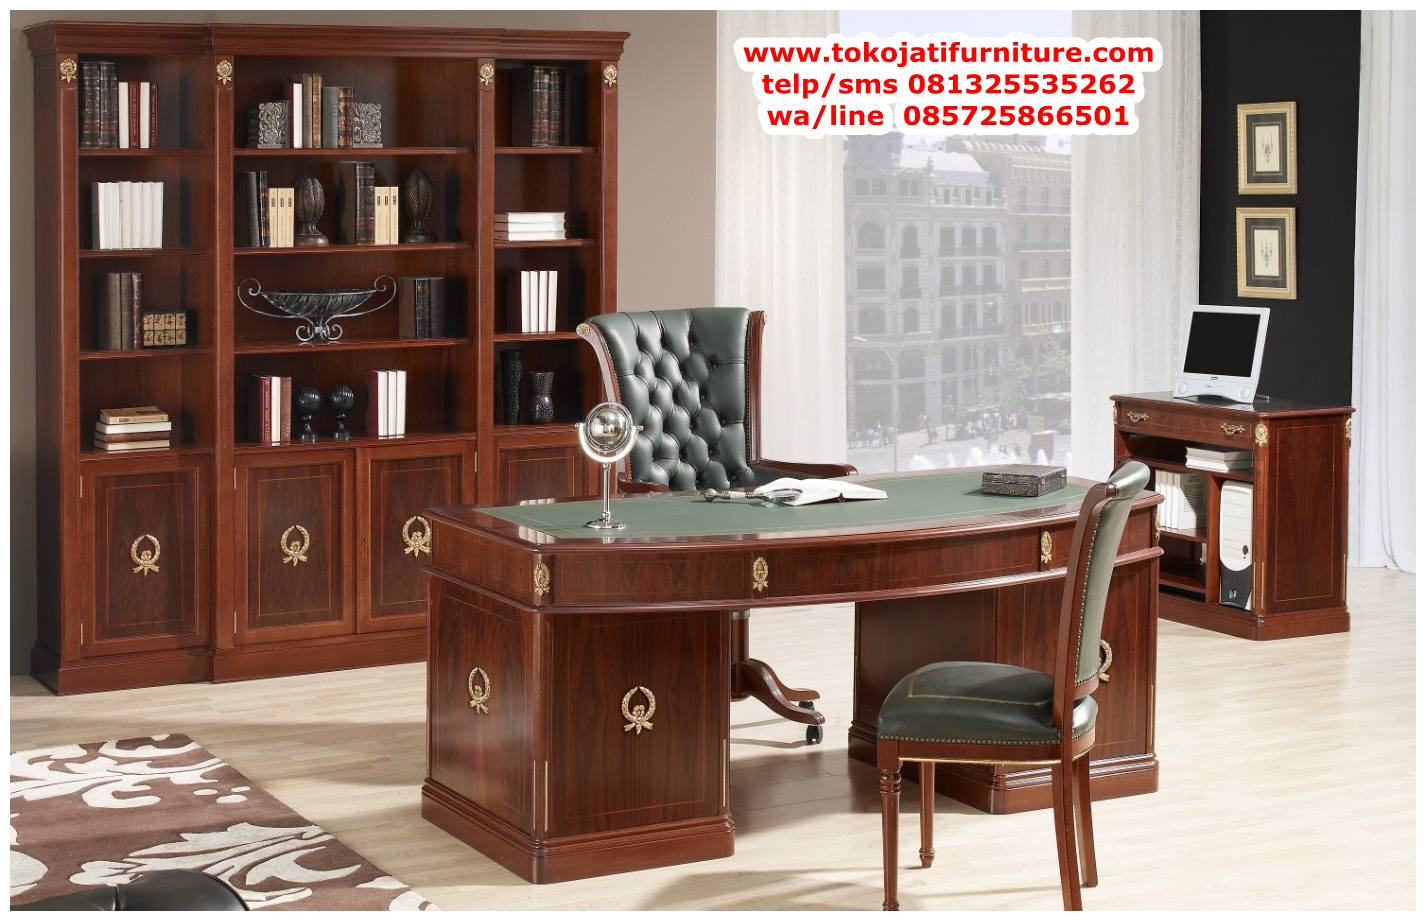 meja-kantor-klasik-jati-mewah meja kantor klasik jati mewah